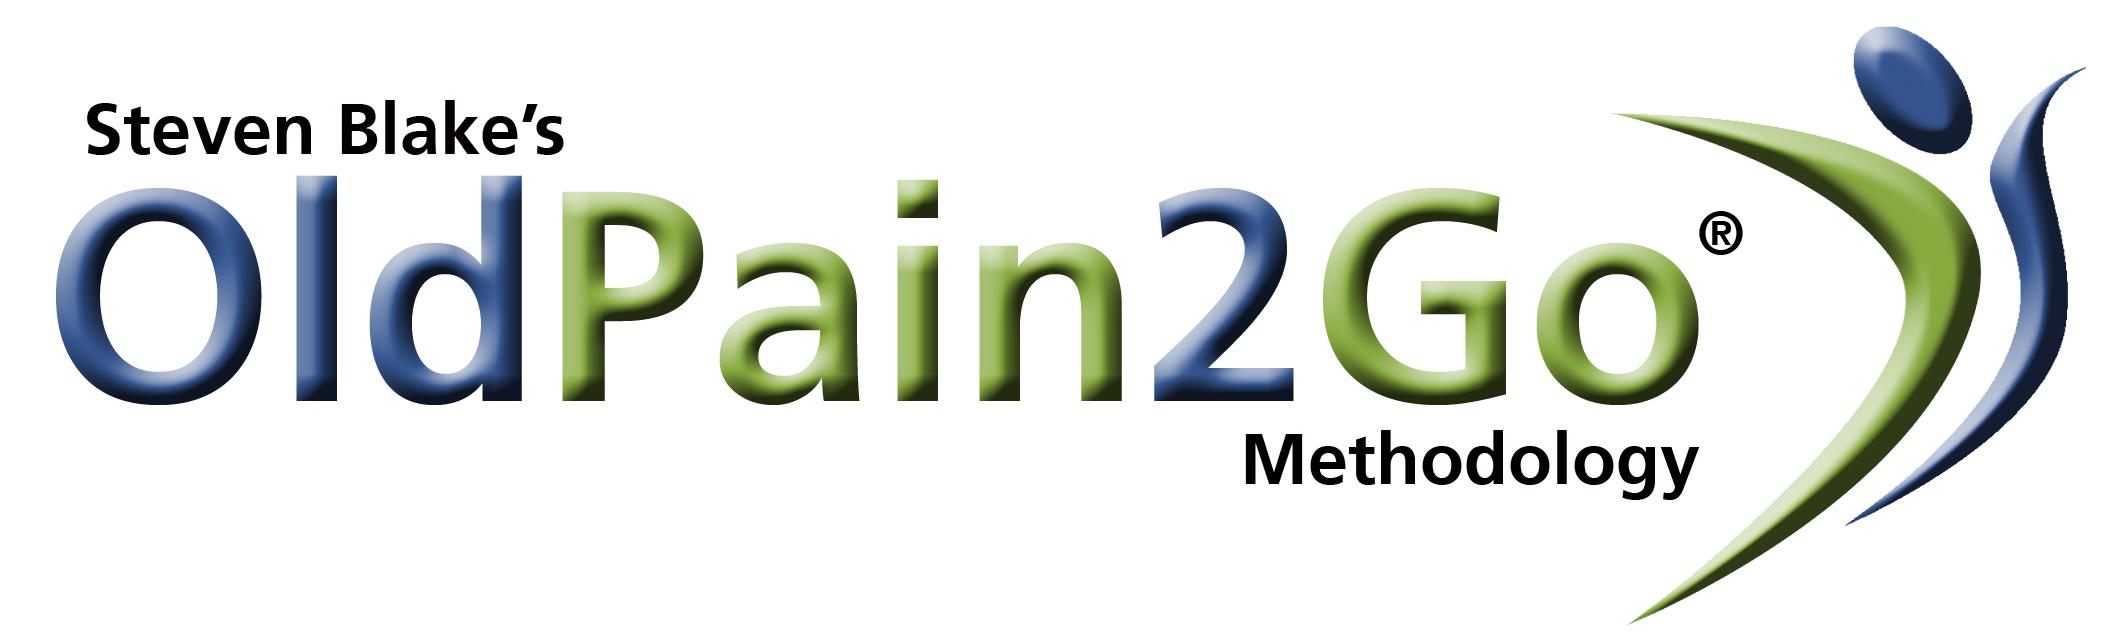 https://oldpain2go.com/wp-content/uploads/2018/02/2018-logo-copy.jpg